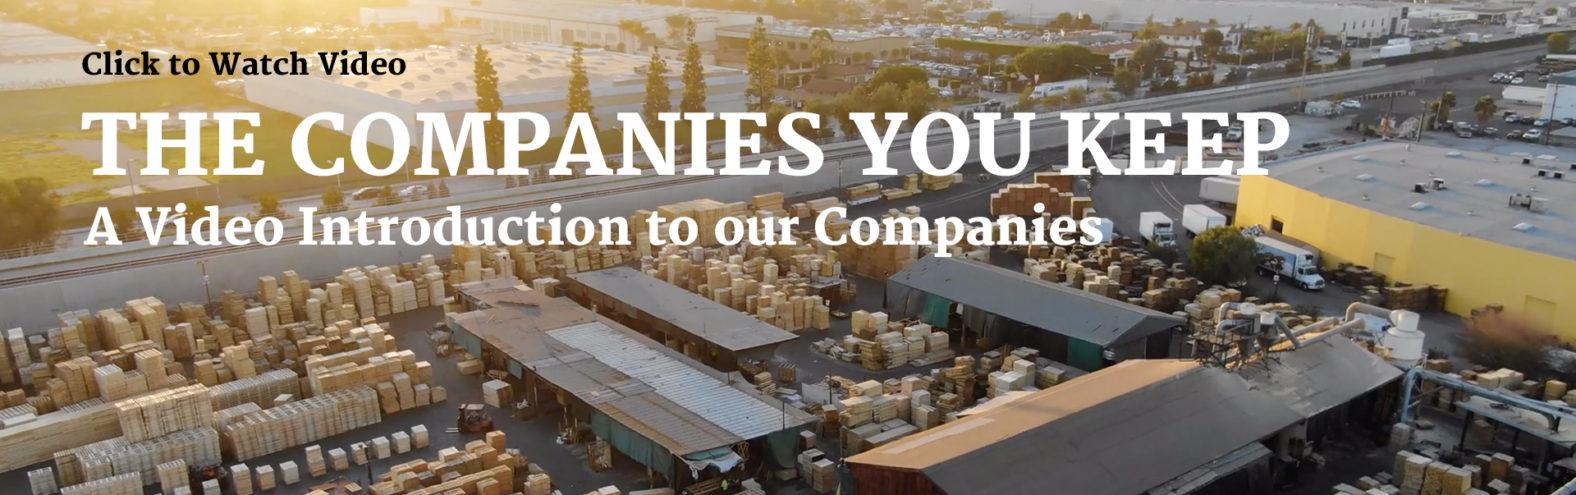 The Companies You Keep